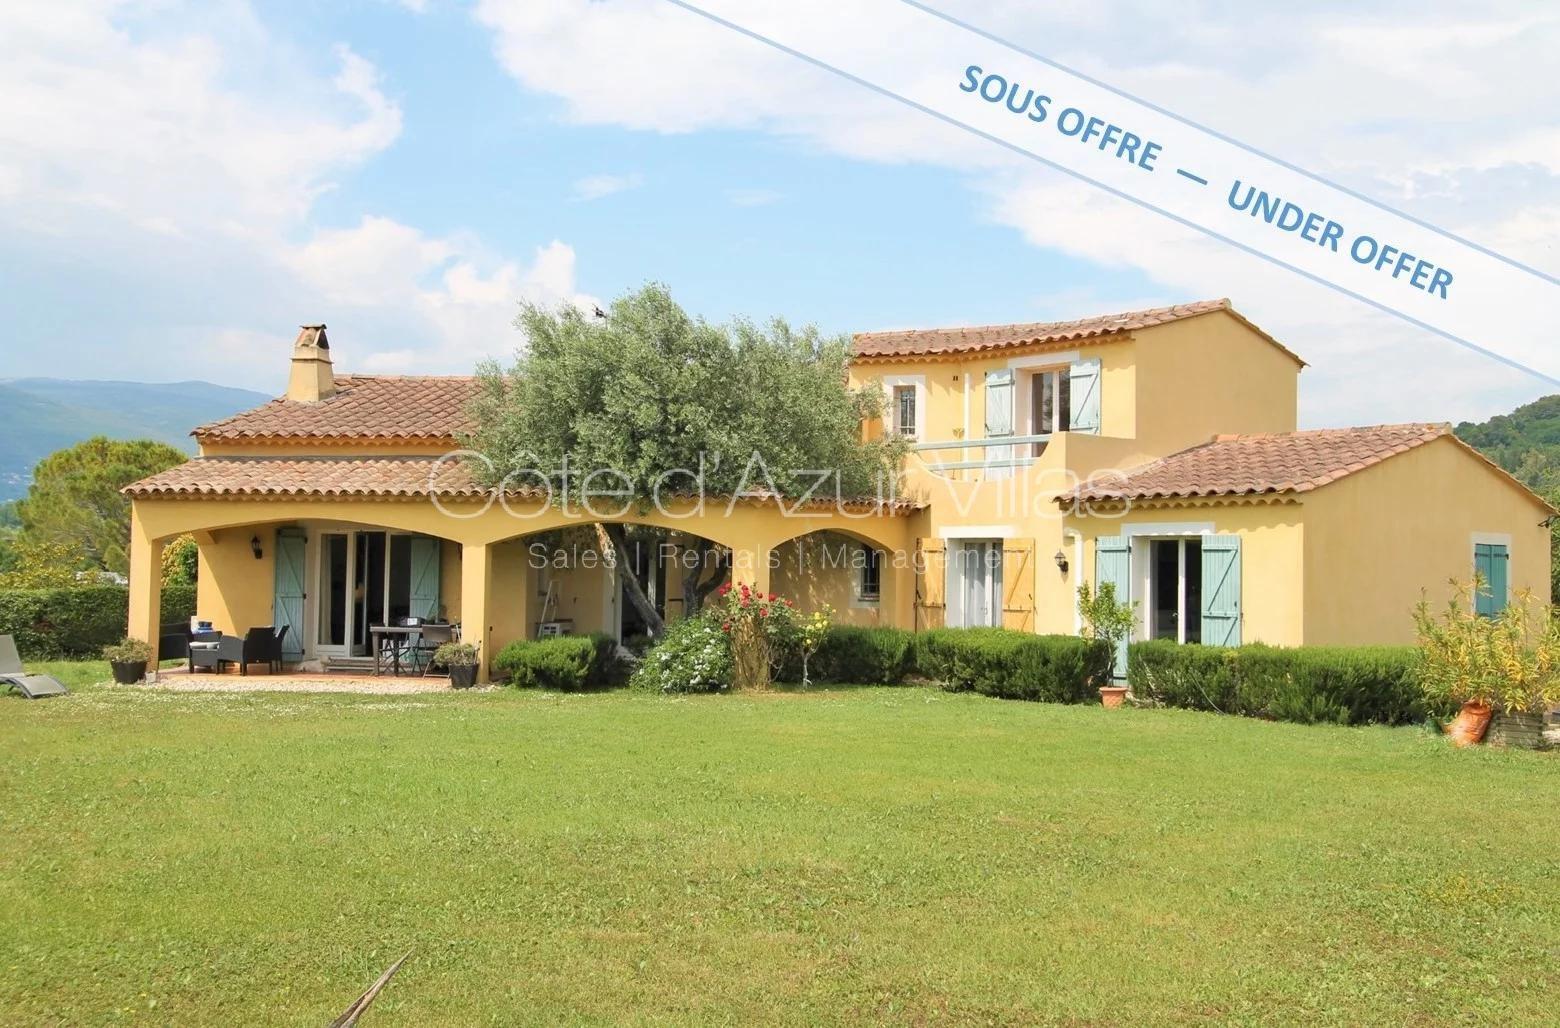 Verkauf Haus - Mouans-Sartoux